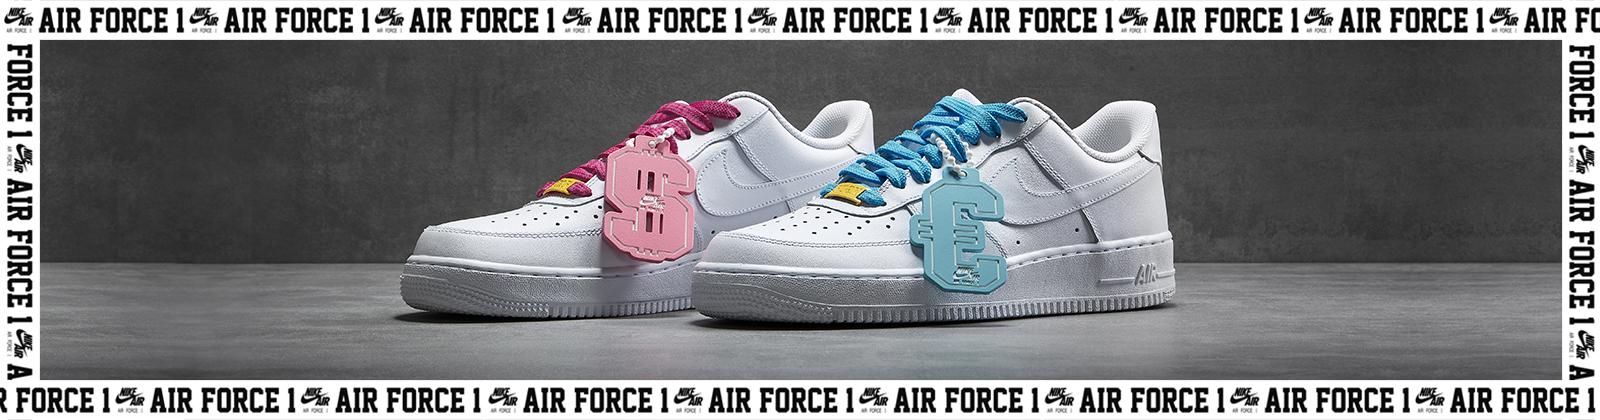 air force sfera ebbasta 63% di sconto trevisomtb.it